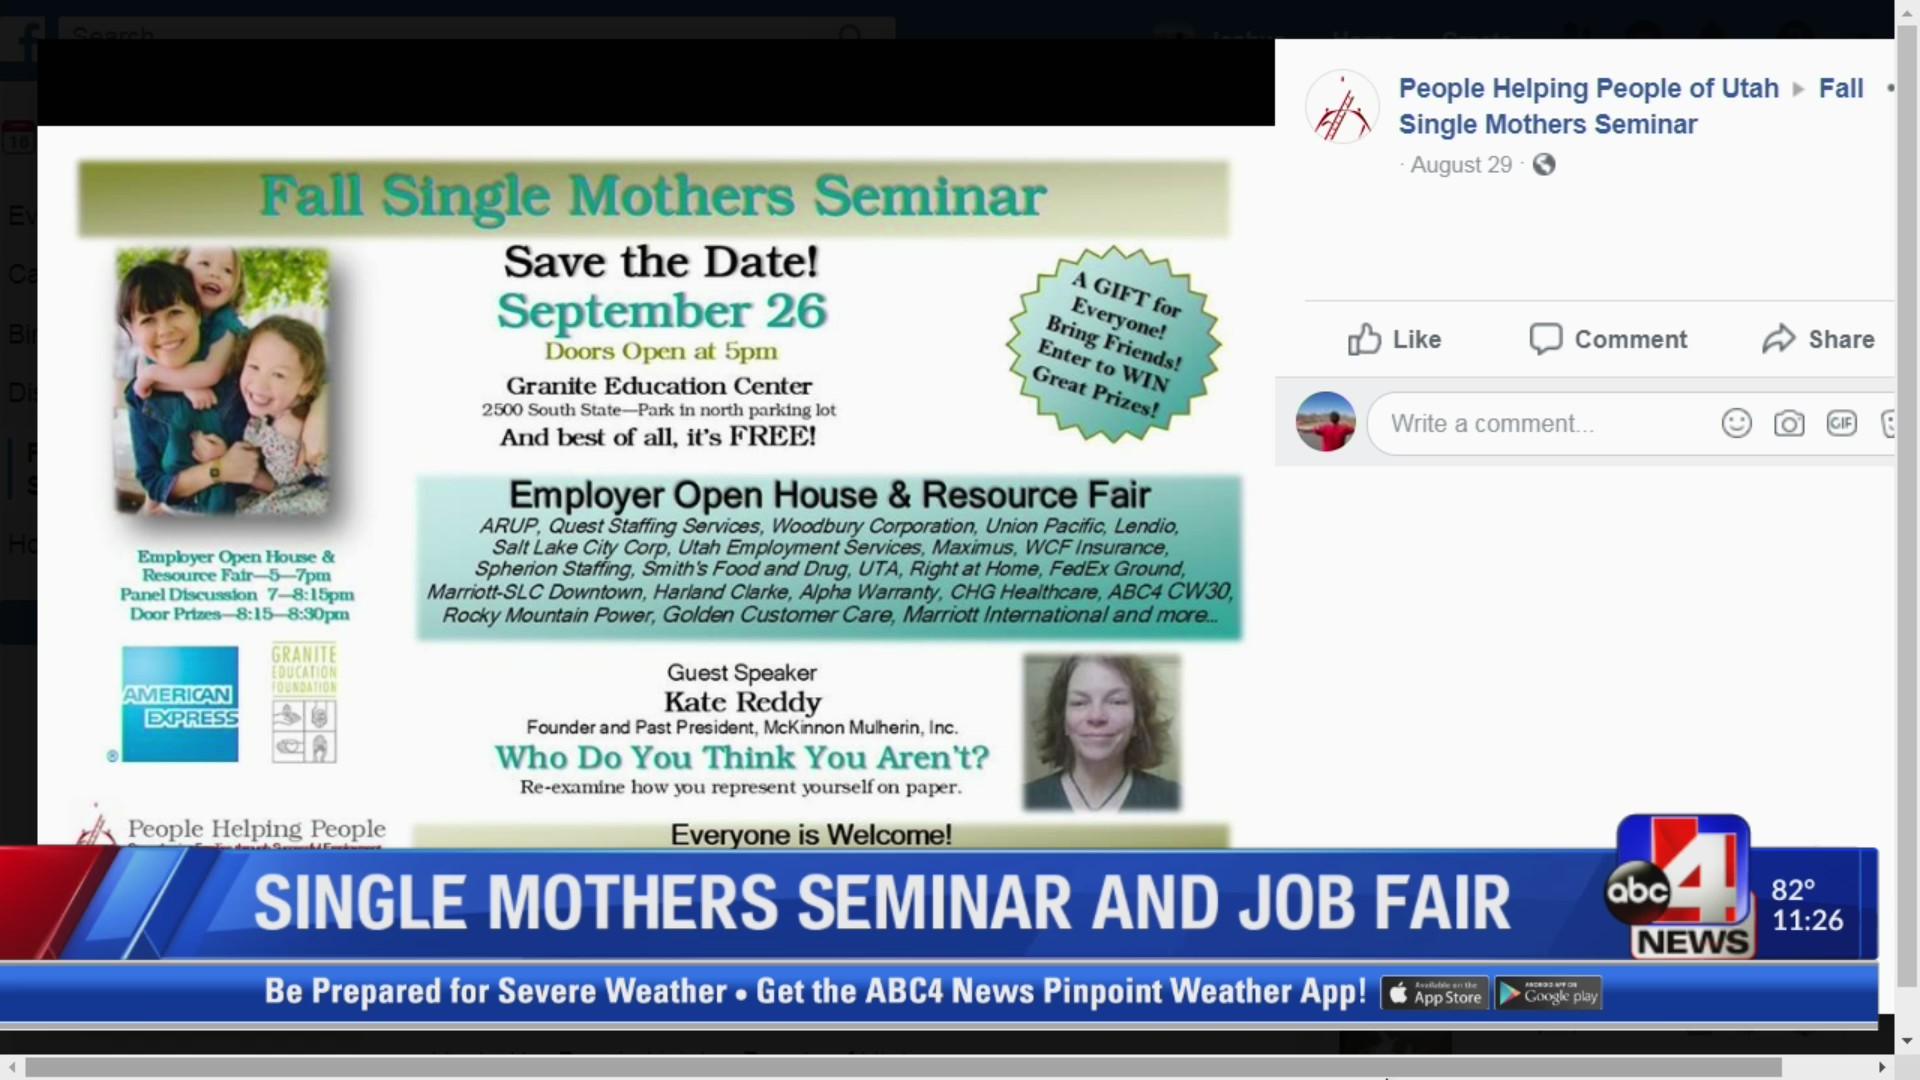 Single Mothers Seminar And Job Fair